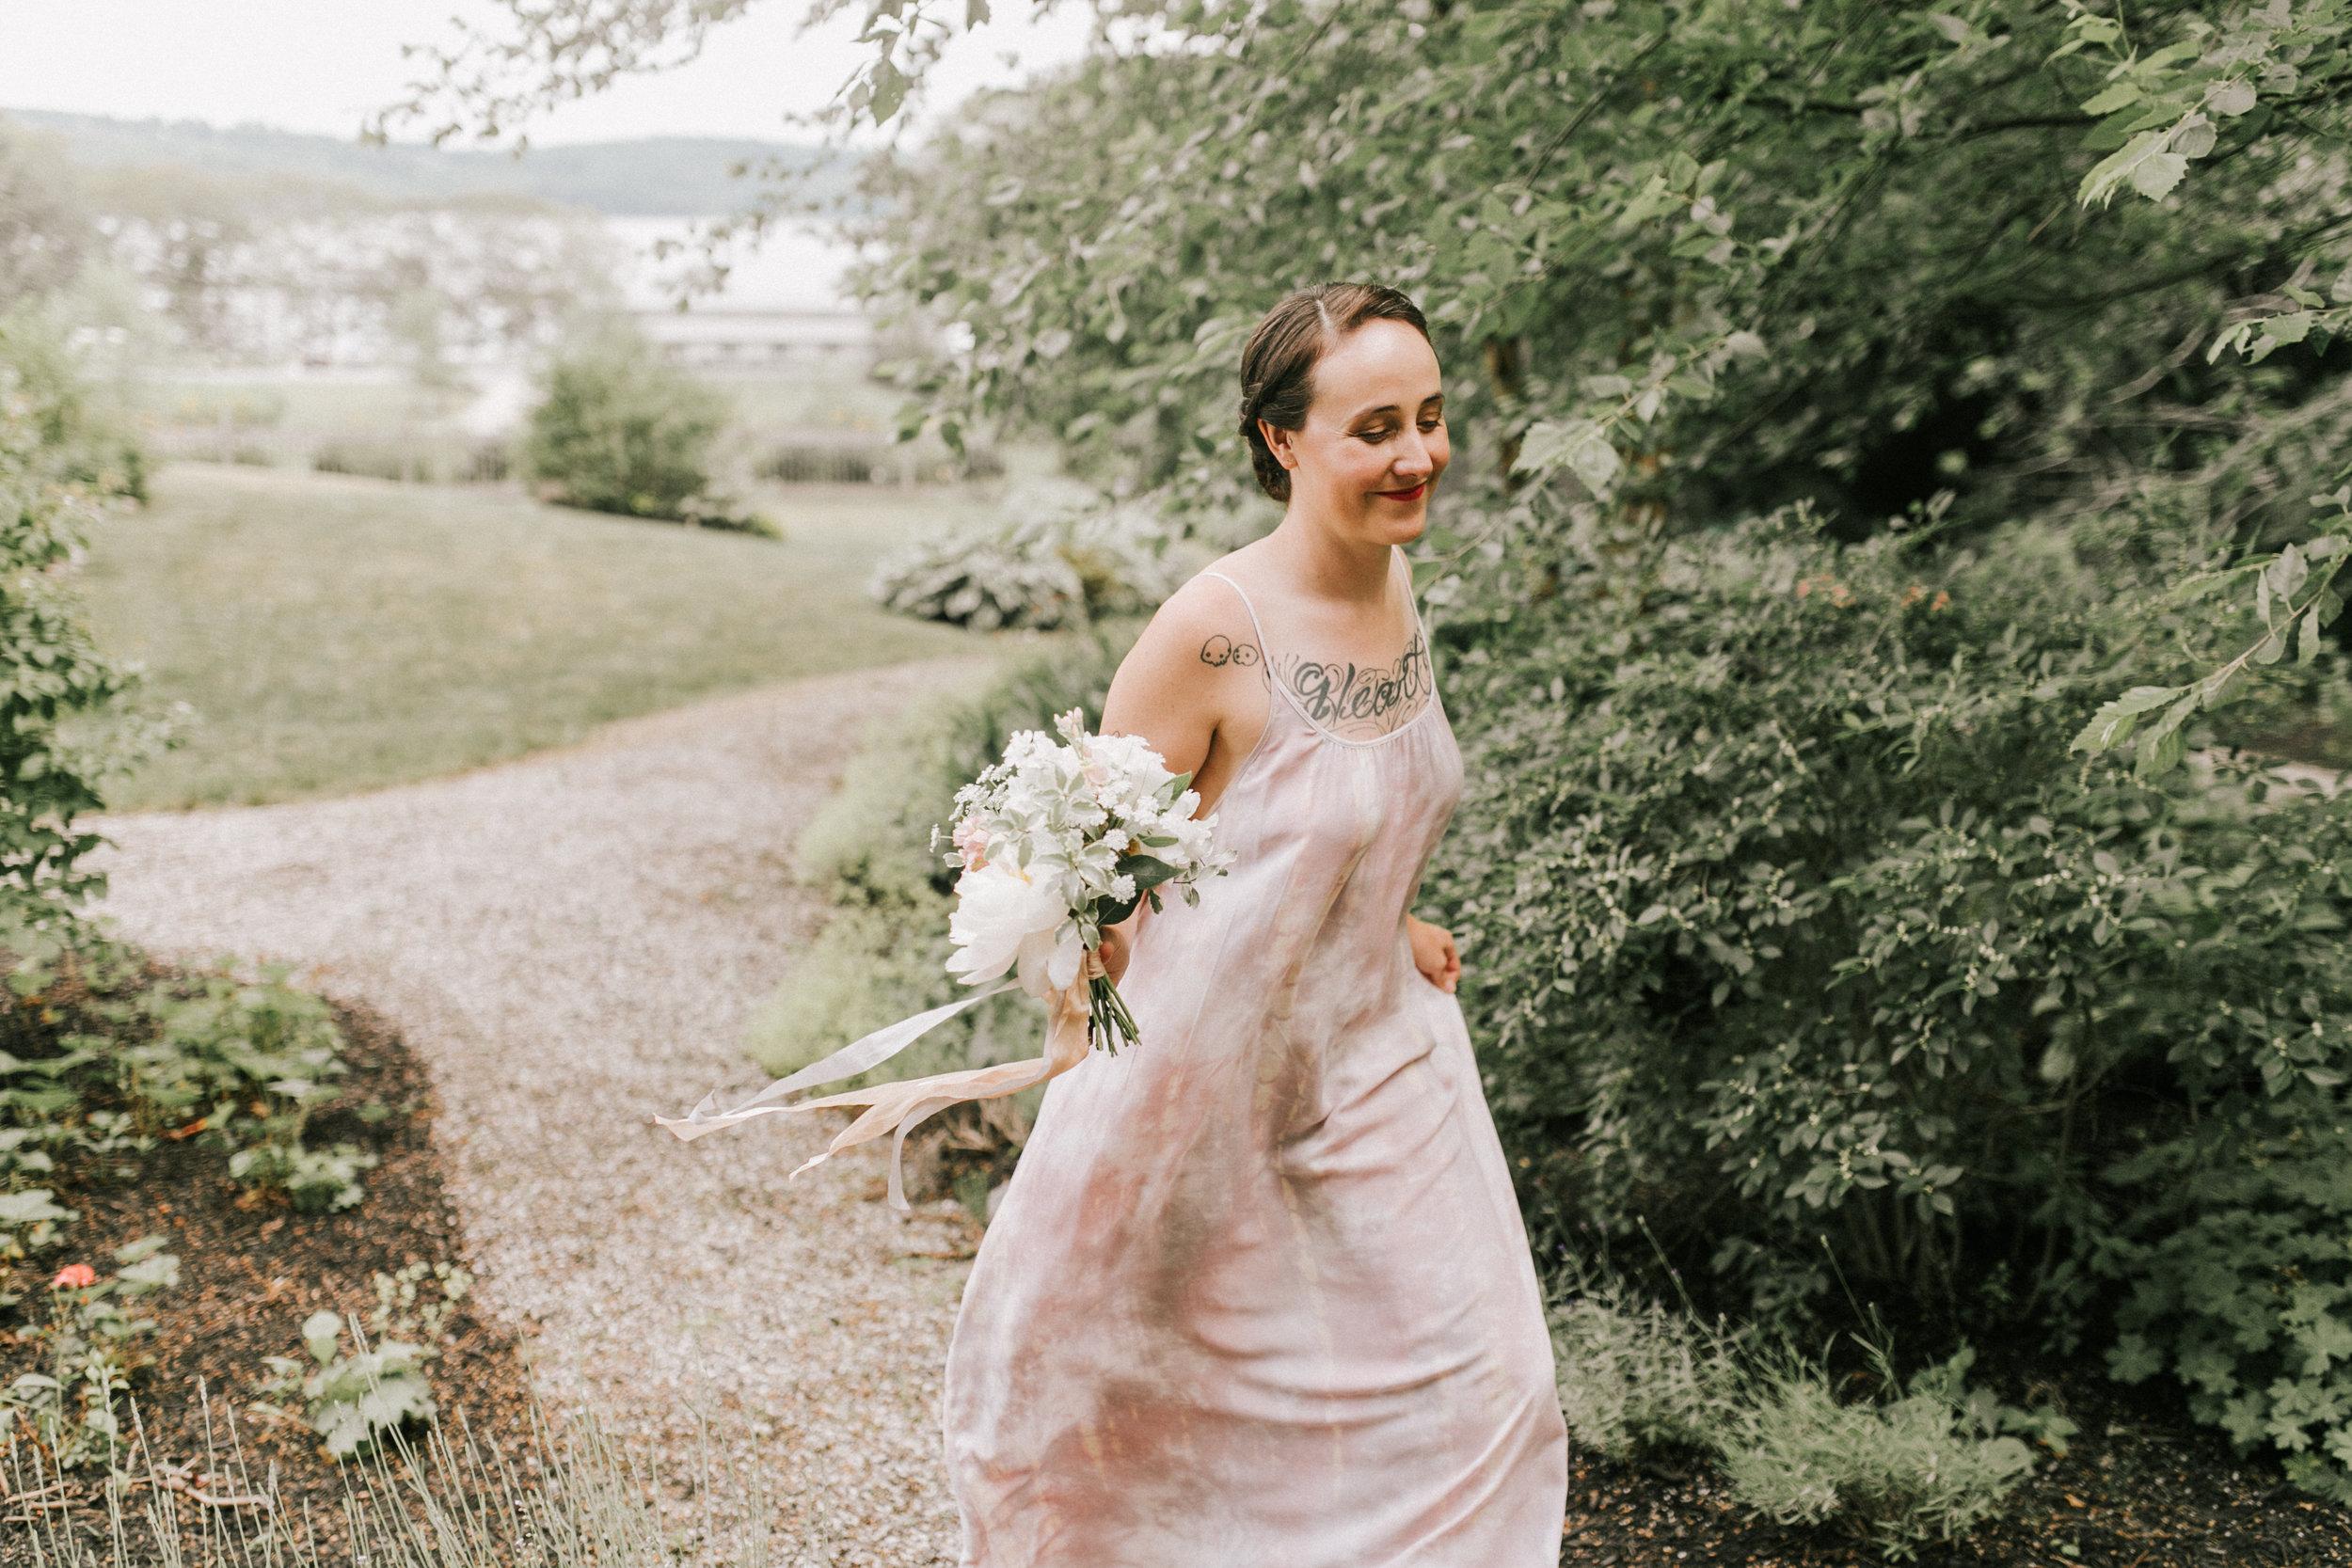 Watershed_Floral_Marianmade_Farm_Wedding_JamieMercurioPhoto2018-107.jpg